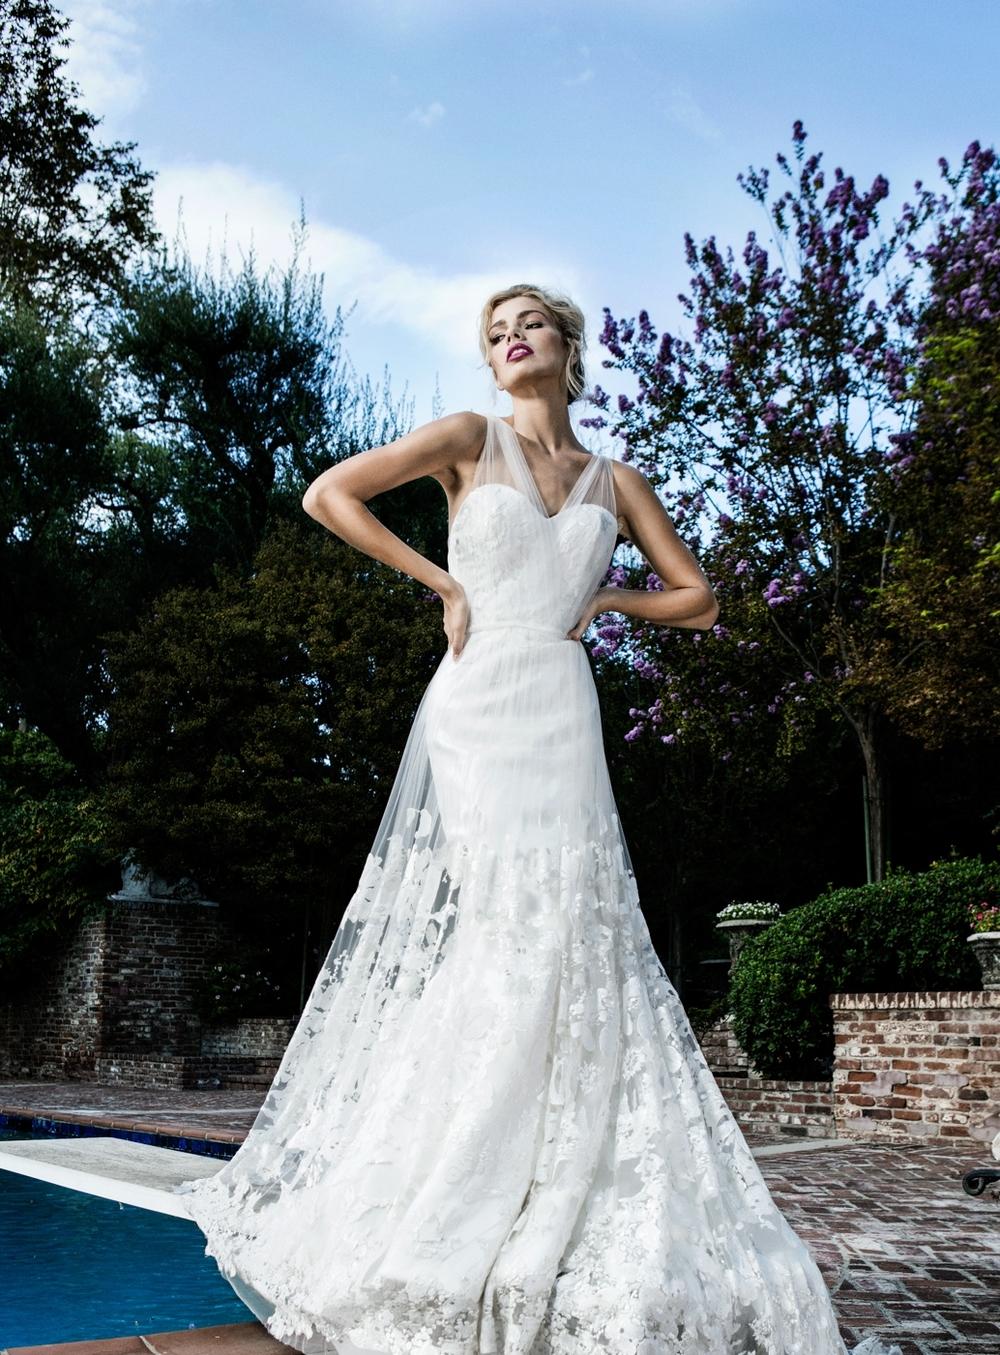 Bridal_Paige_C_-0250_wk-WEB.jpg